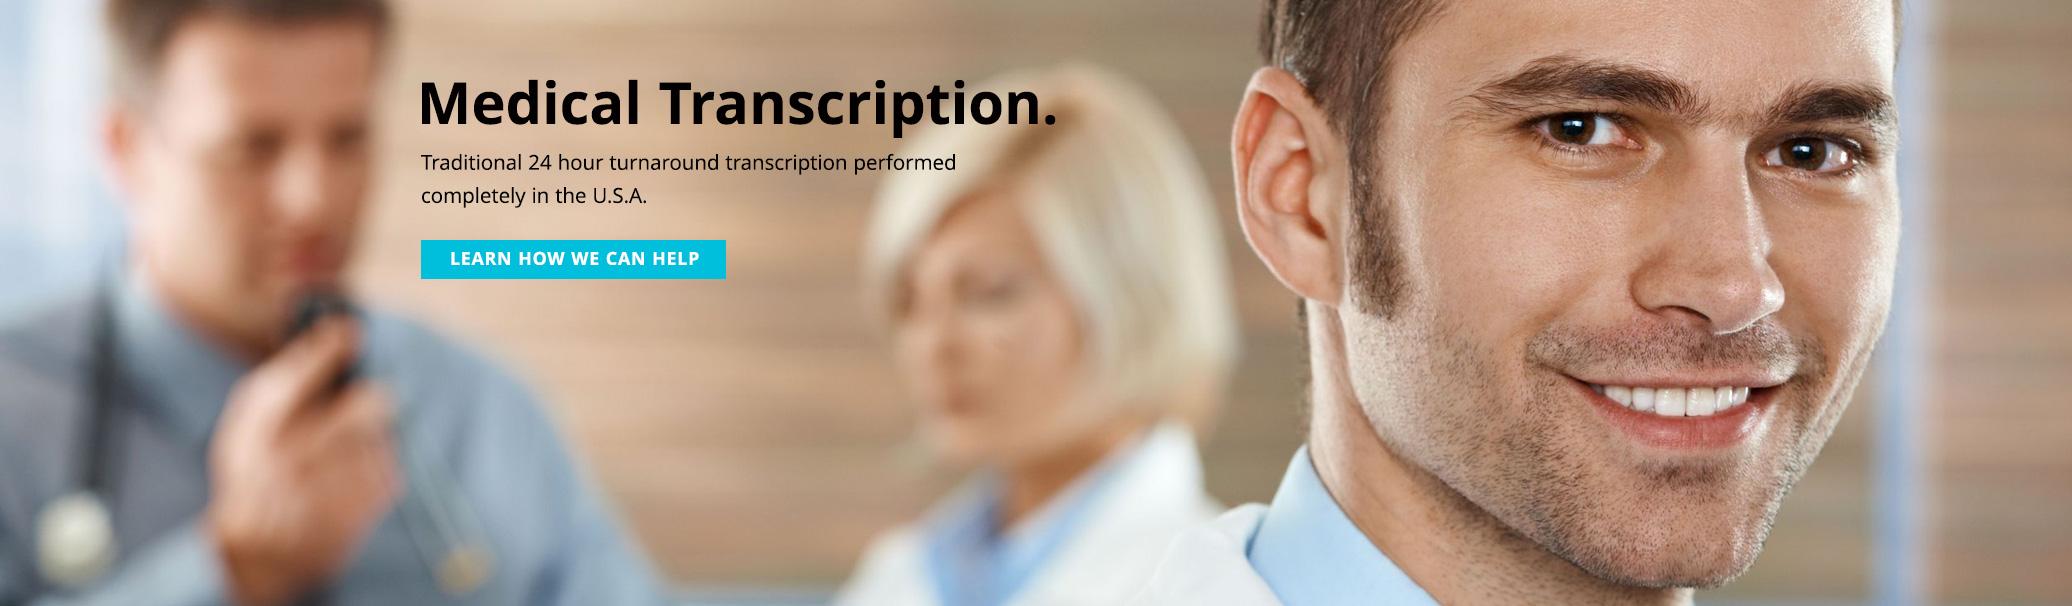 U.S.A. Based Medical Transcribers